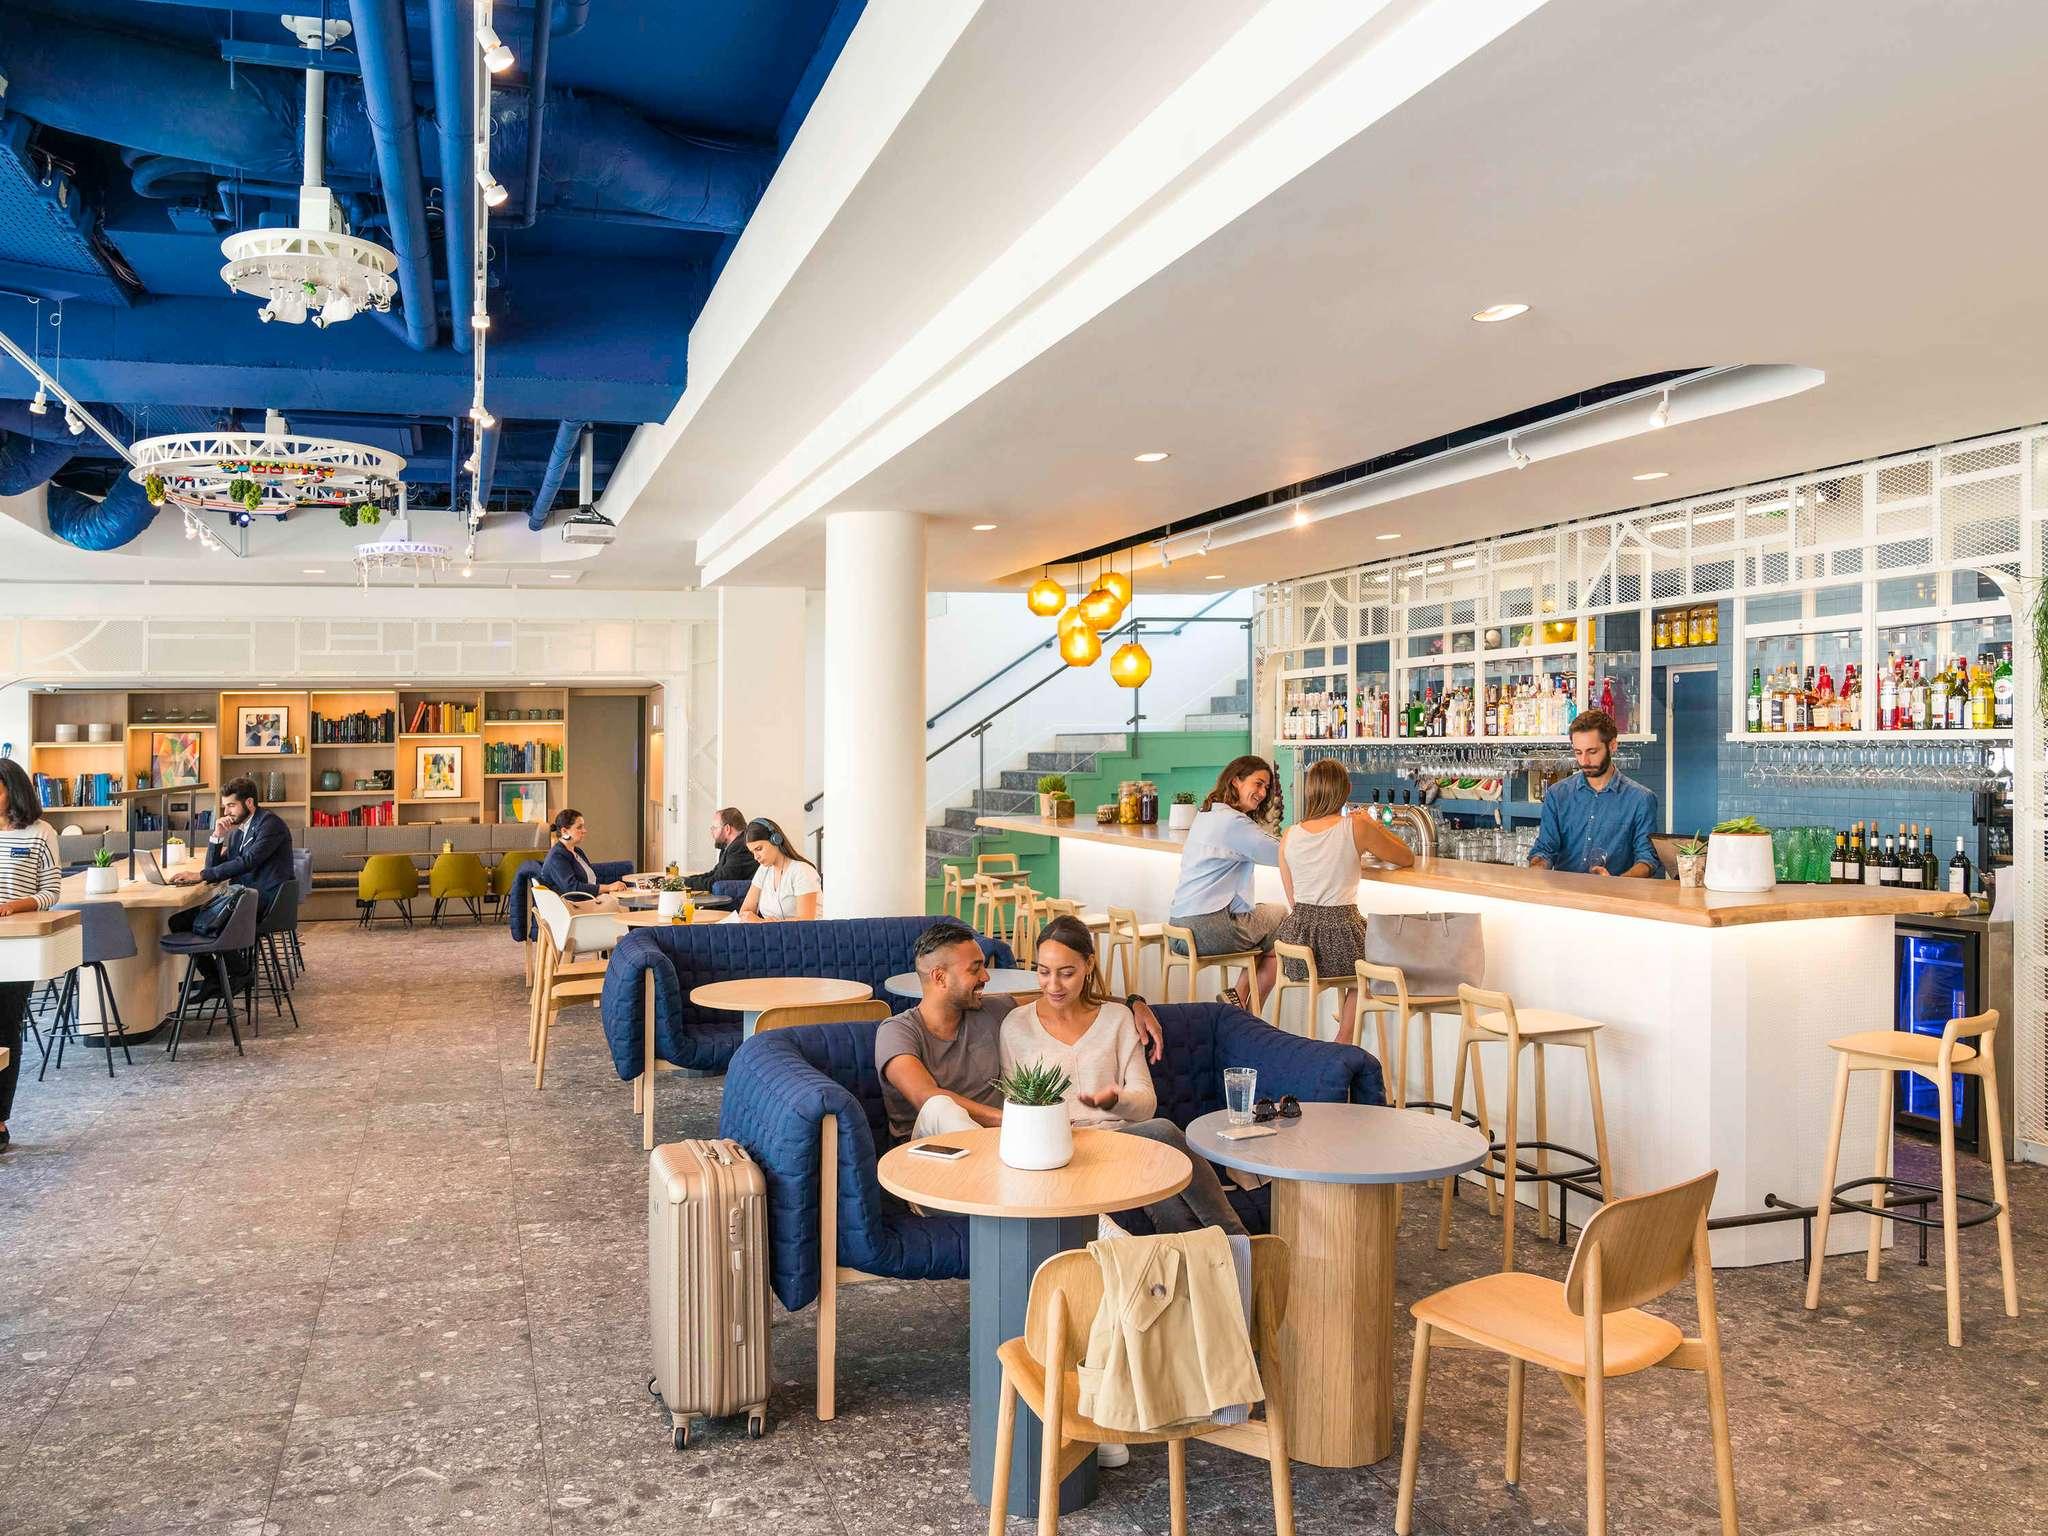 Hotel – Novotel Parigi Gare Montparnasse